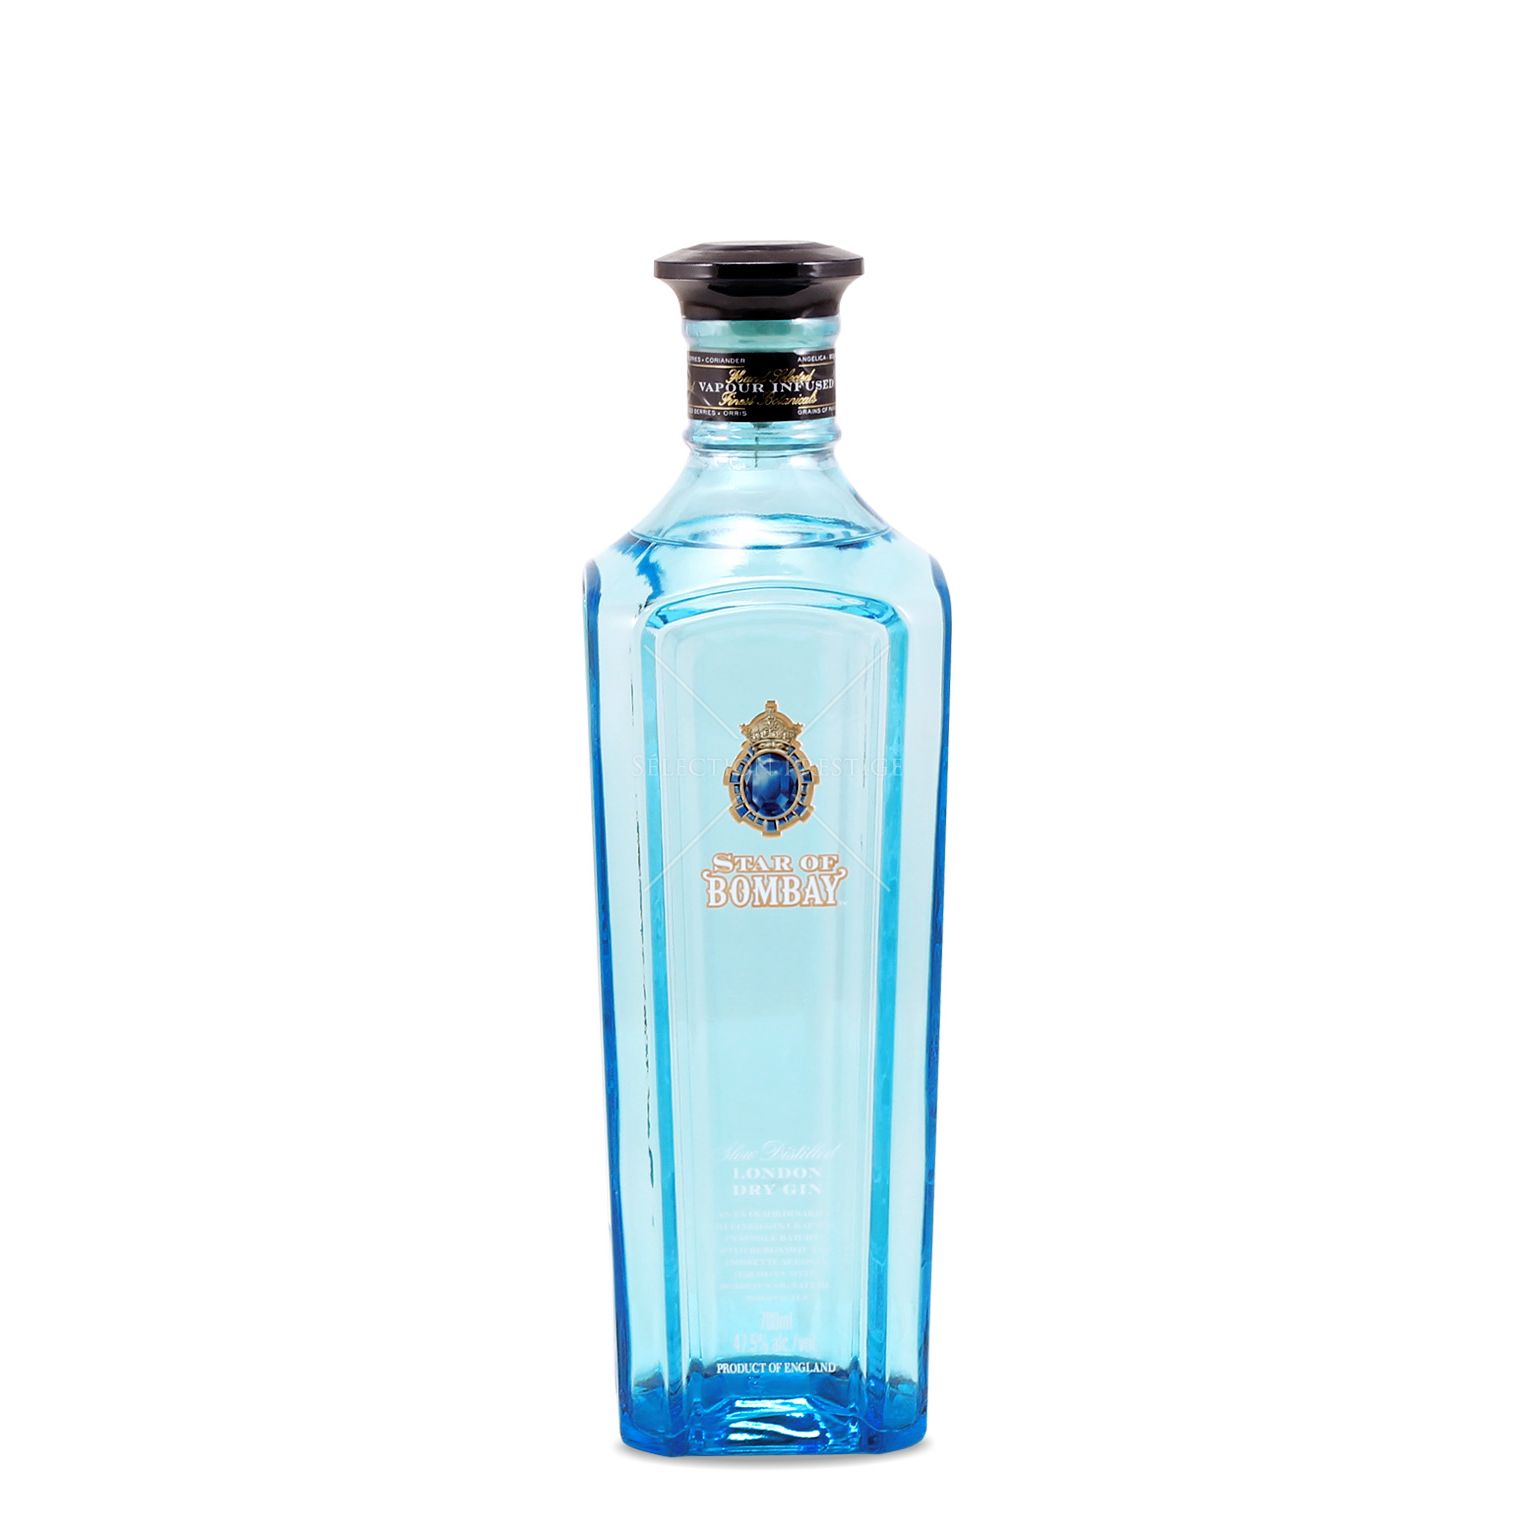 Star Of Bombay London Dry Gin 0 7l 47 5 Vol Bombay